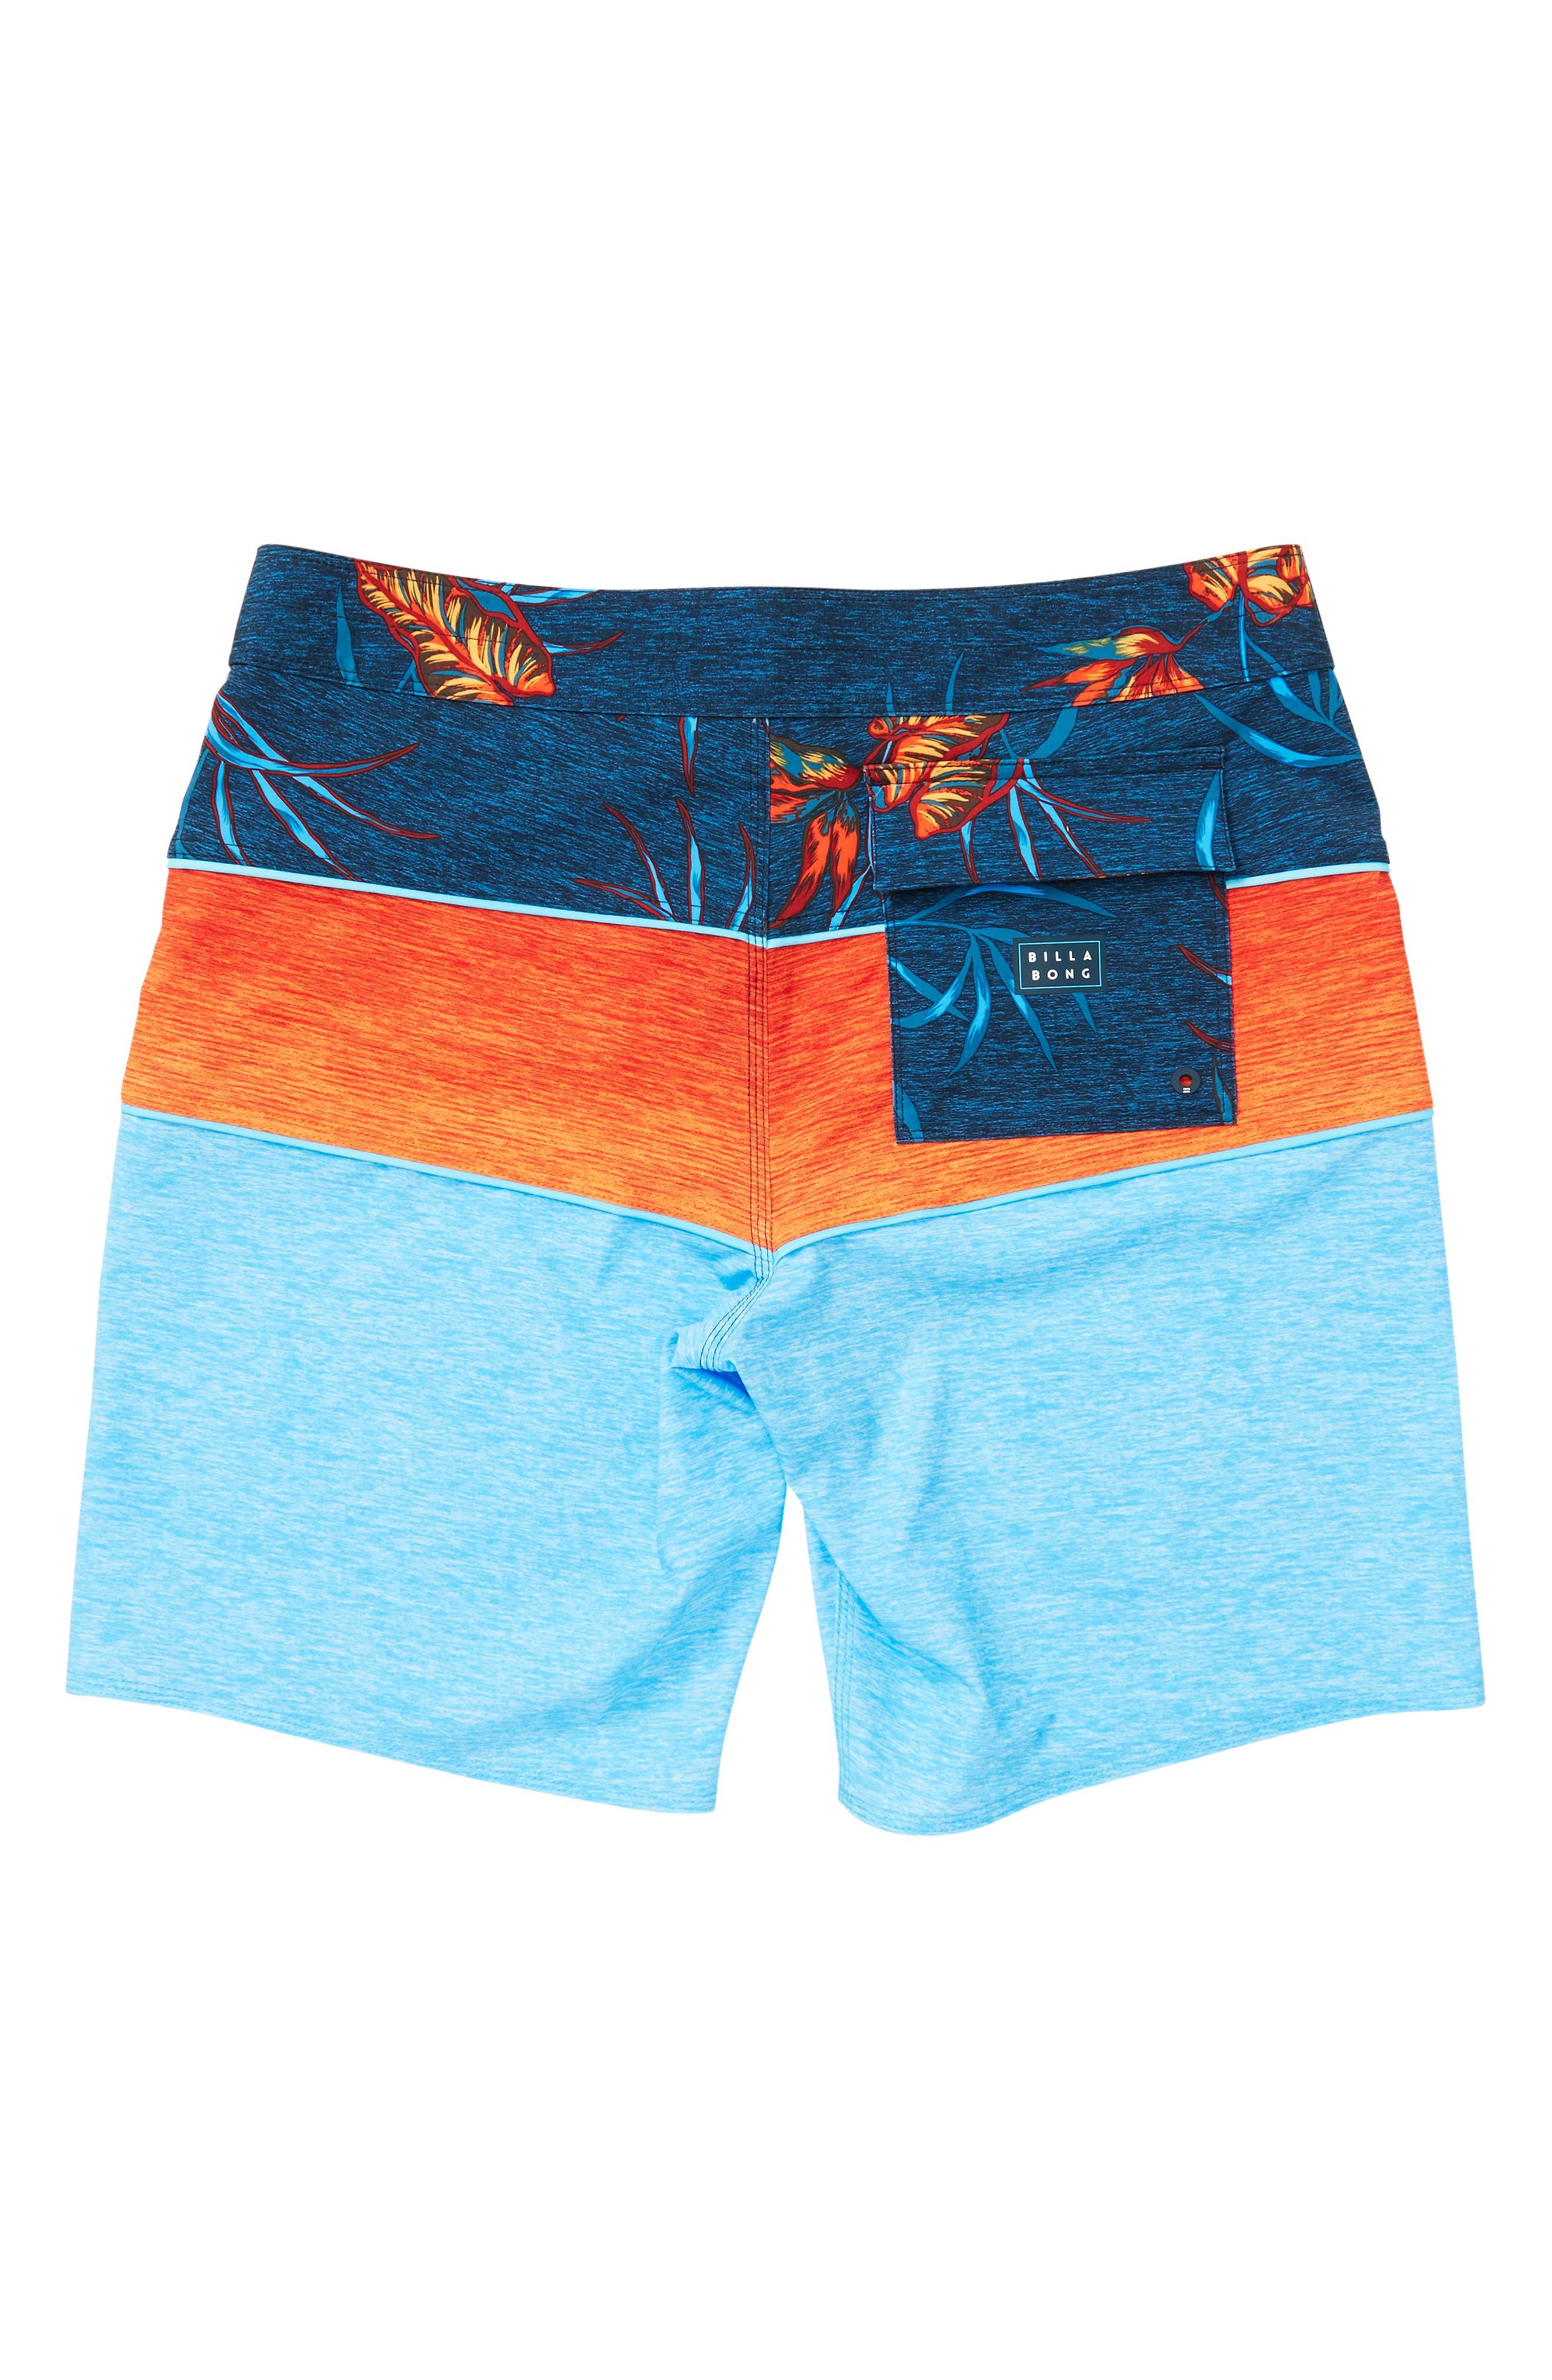 Tribong X Board Shorts,                             Alternate thumbnail 2, color,                             CYAN